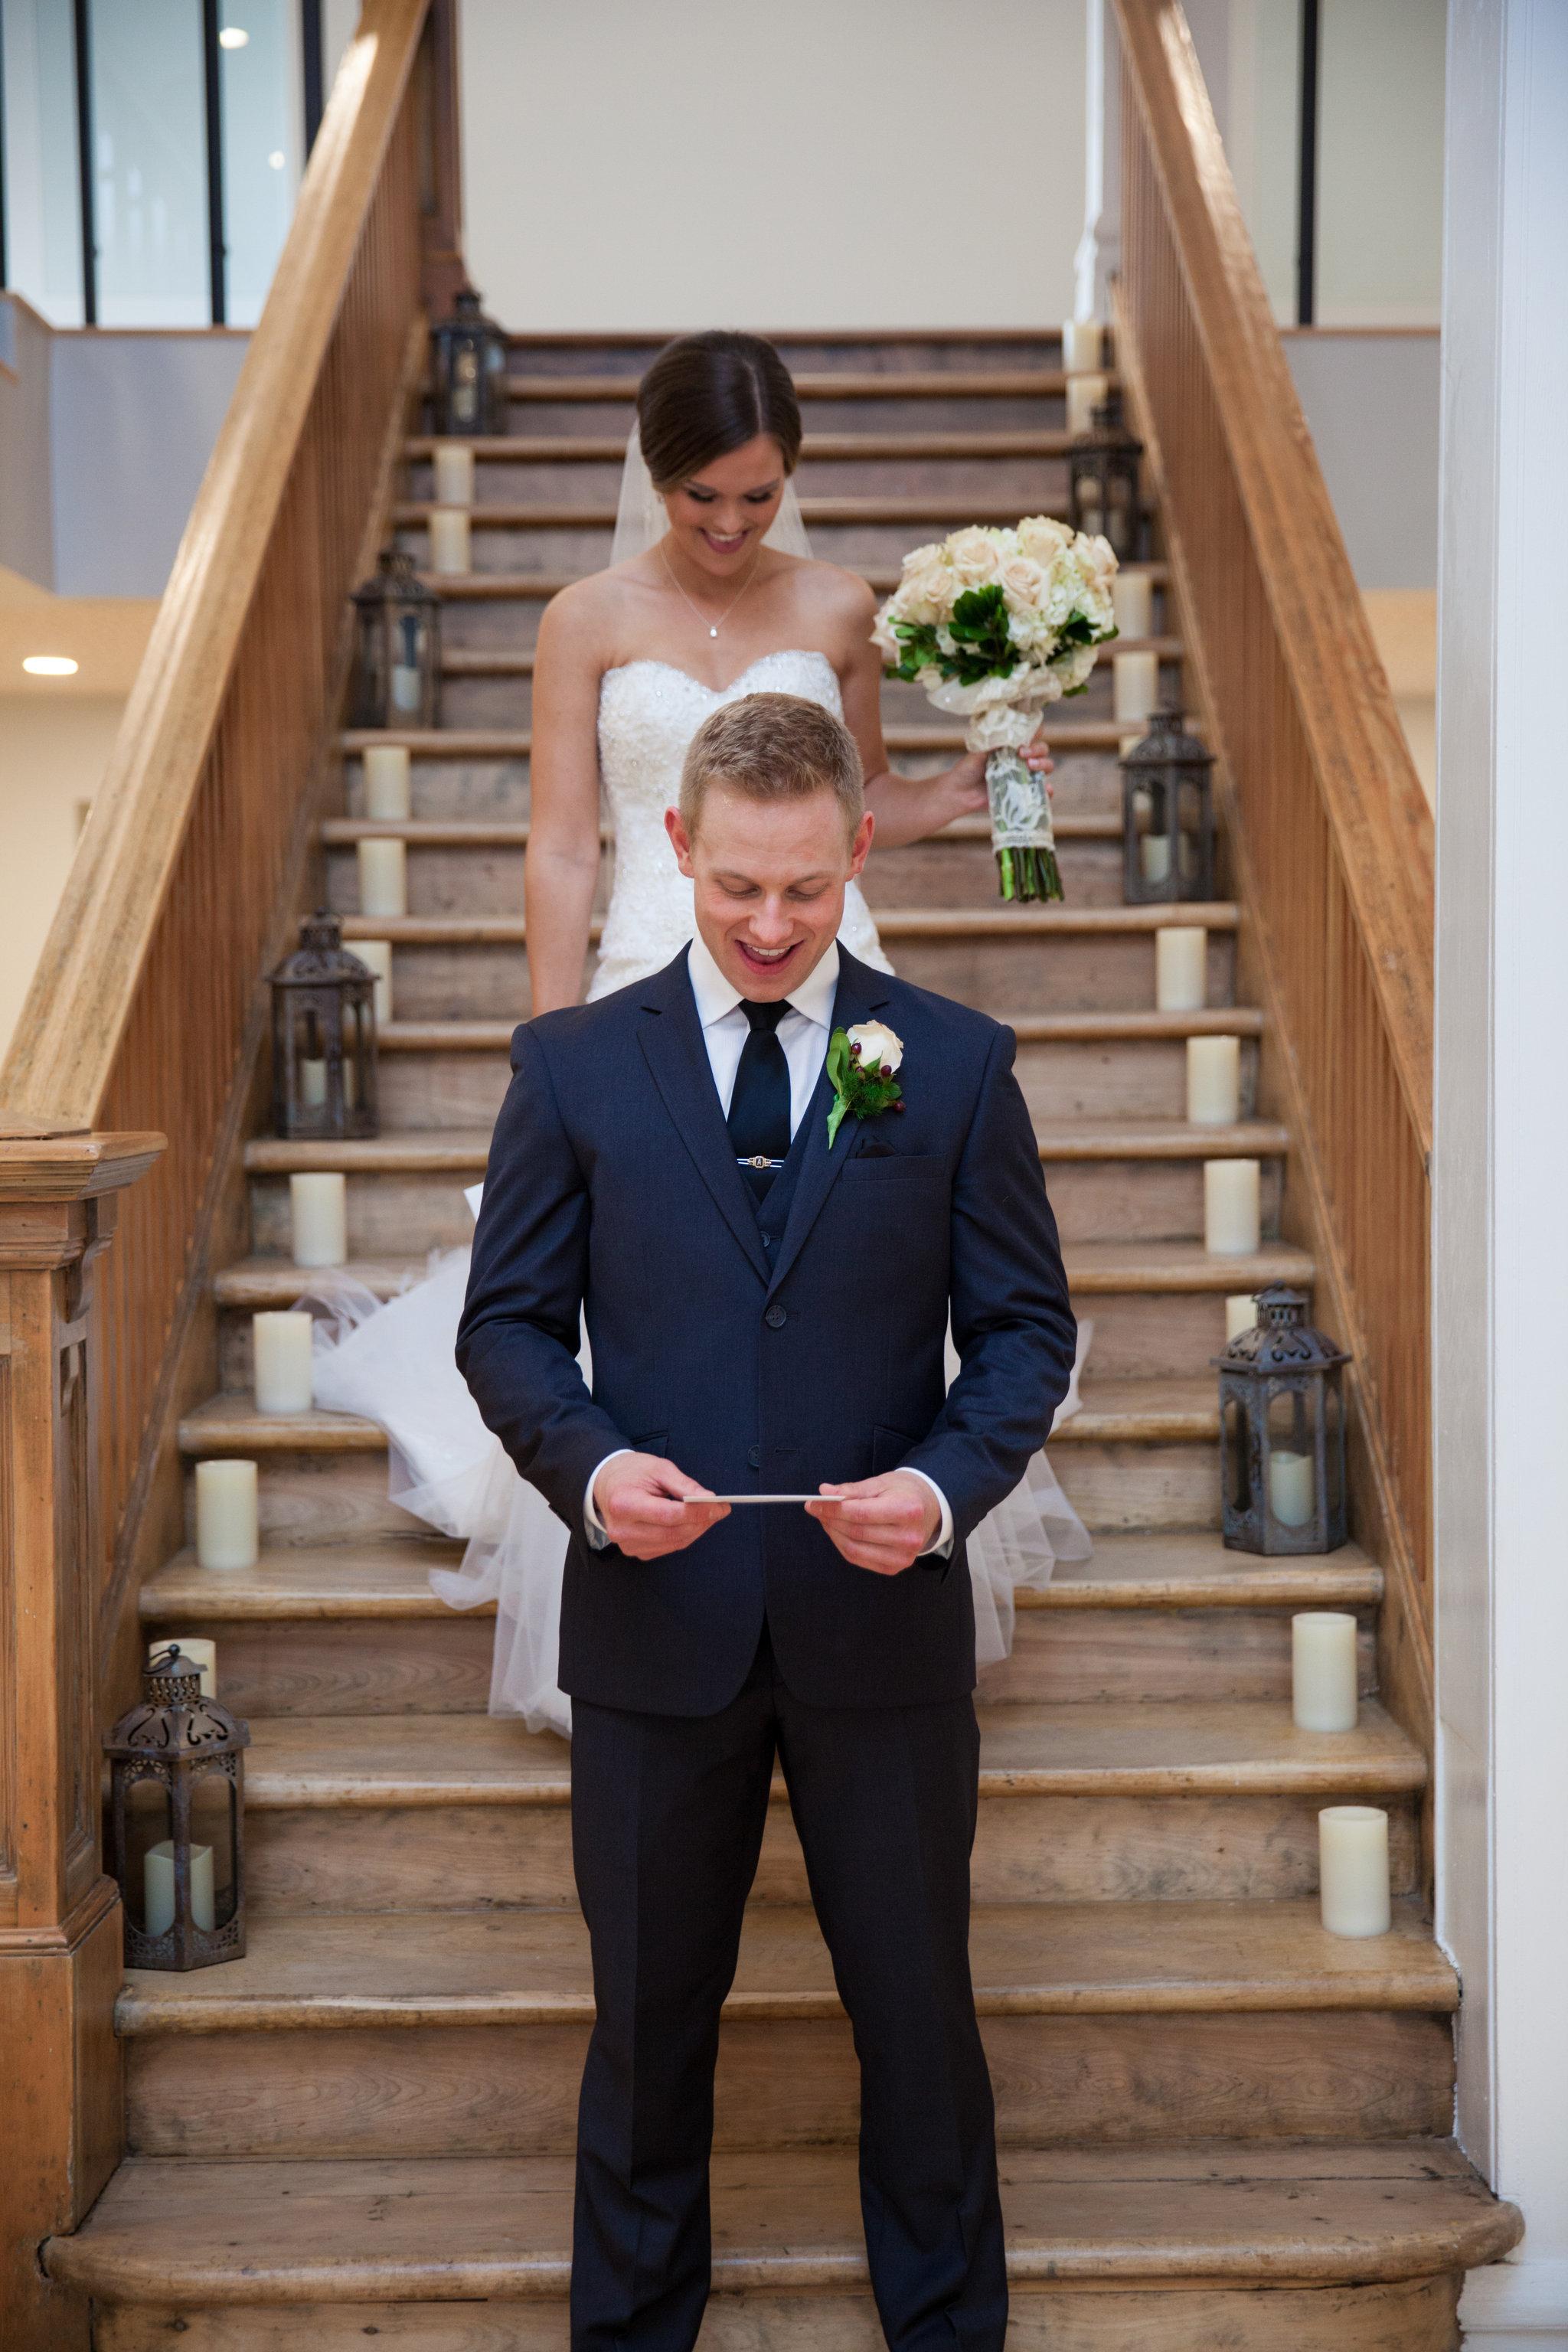 Chasing Autumn Photography, Beveridge Building Medicine Hat, Medicine Hat Wedding Photography, Lethbridge Wedding Photography, Cypress Hills Wedding Photography, Medicine Hat Wedding Photographer